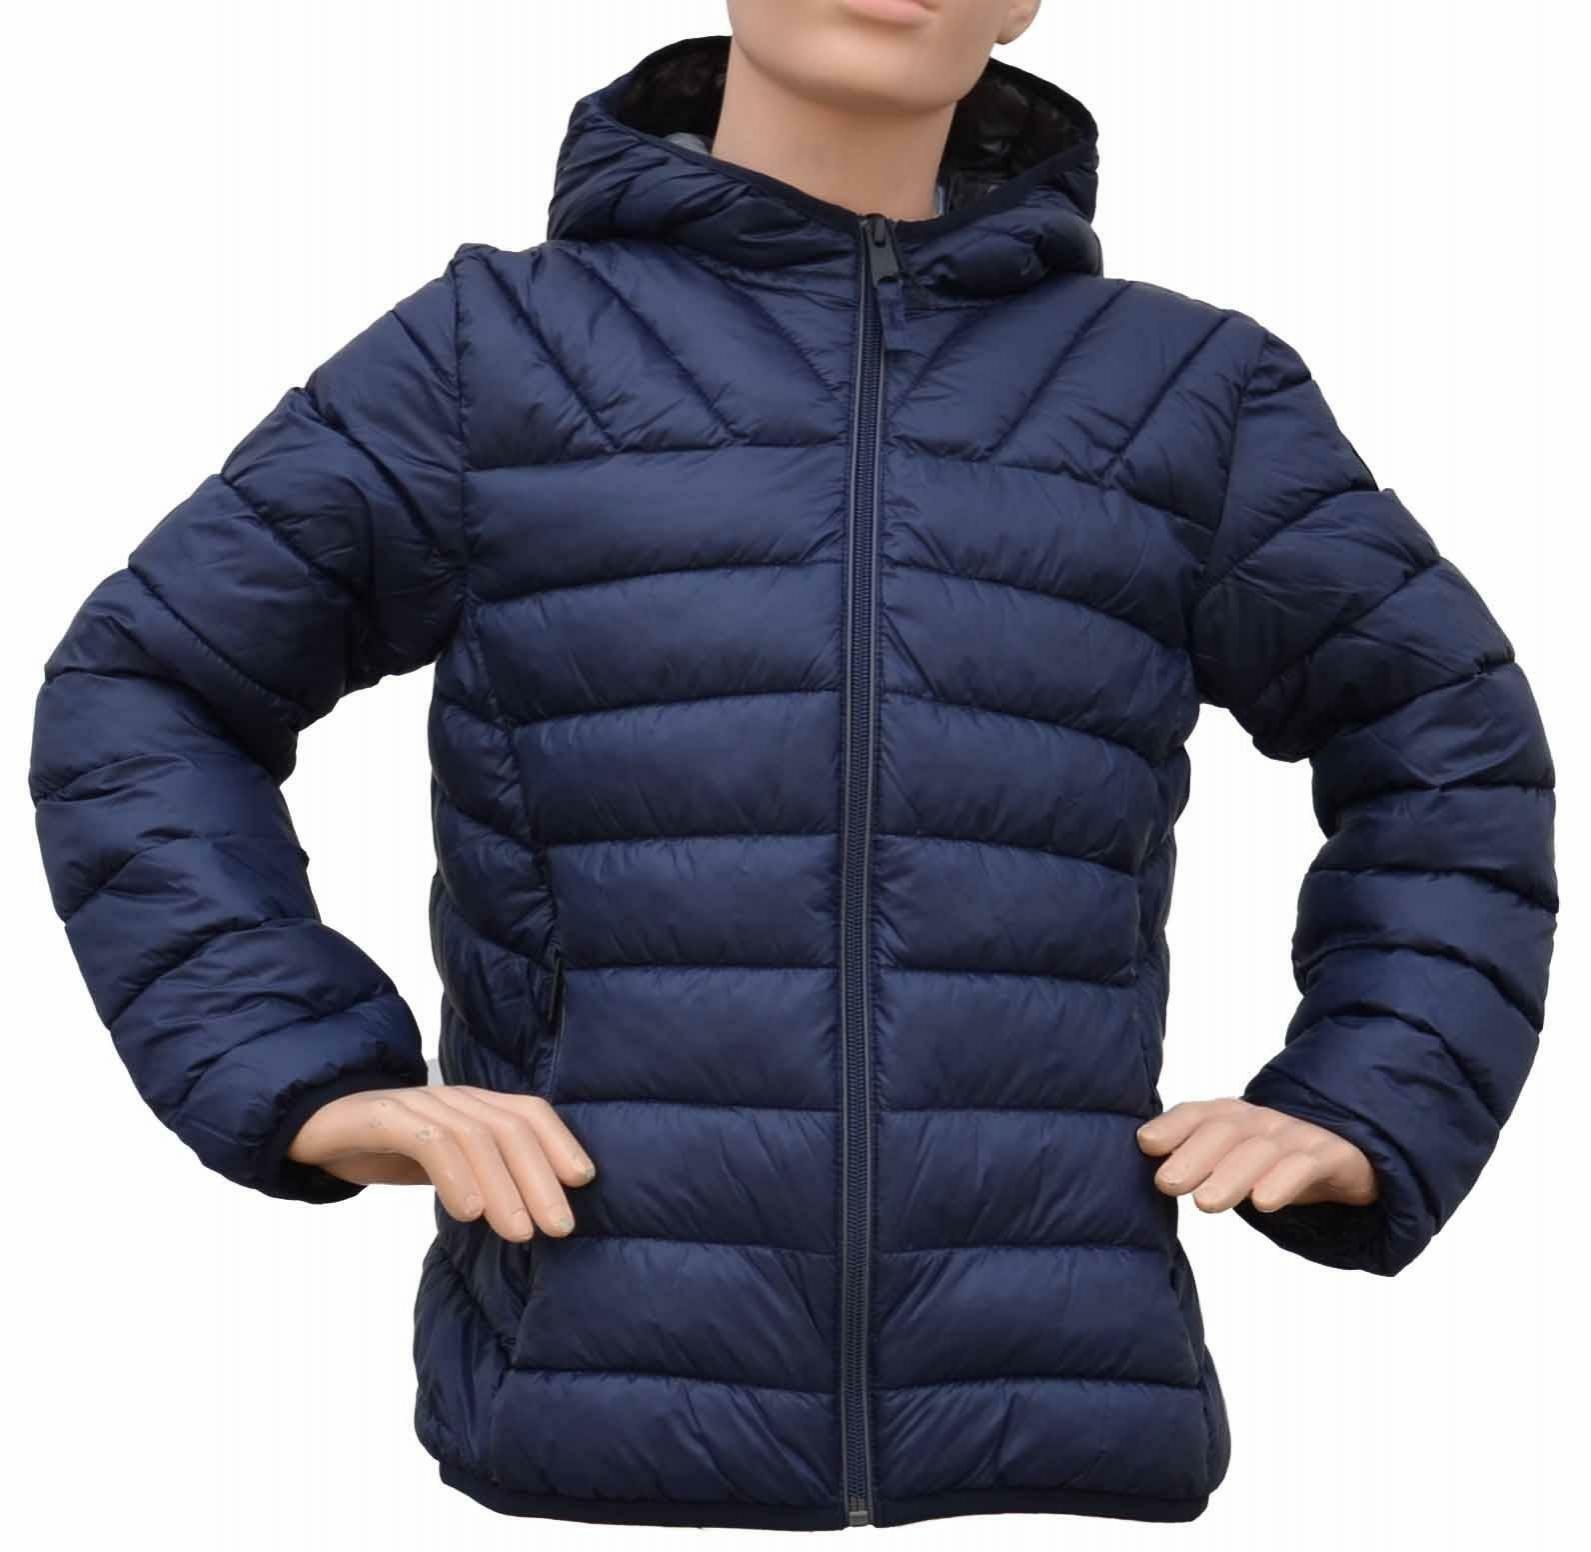 online store a5bfb 95176 Napapijri aerons 2 piumino bambino blu n0yi5y176